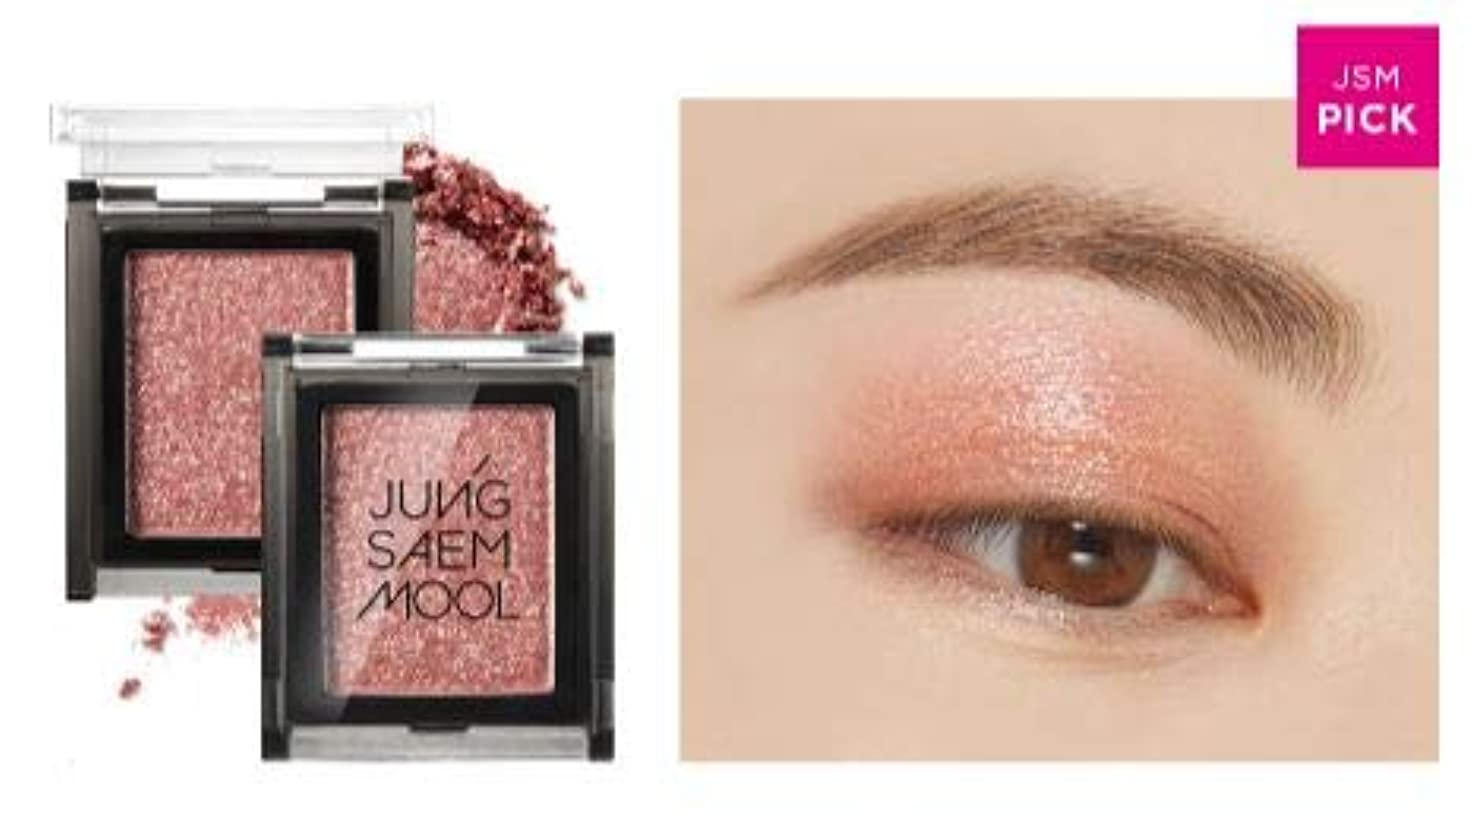 JUNG SAEM MOOL Colorpiece Eyeshadow Prism (FlushUp) [並行輸入品]